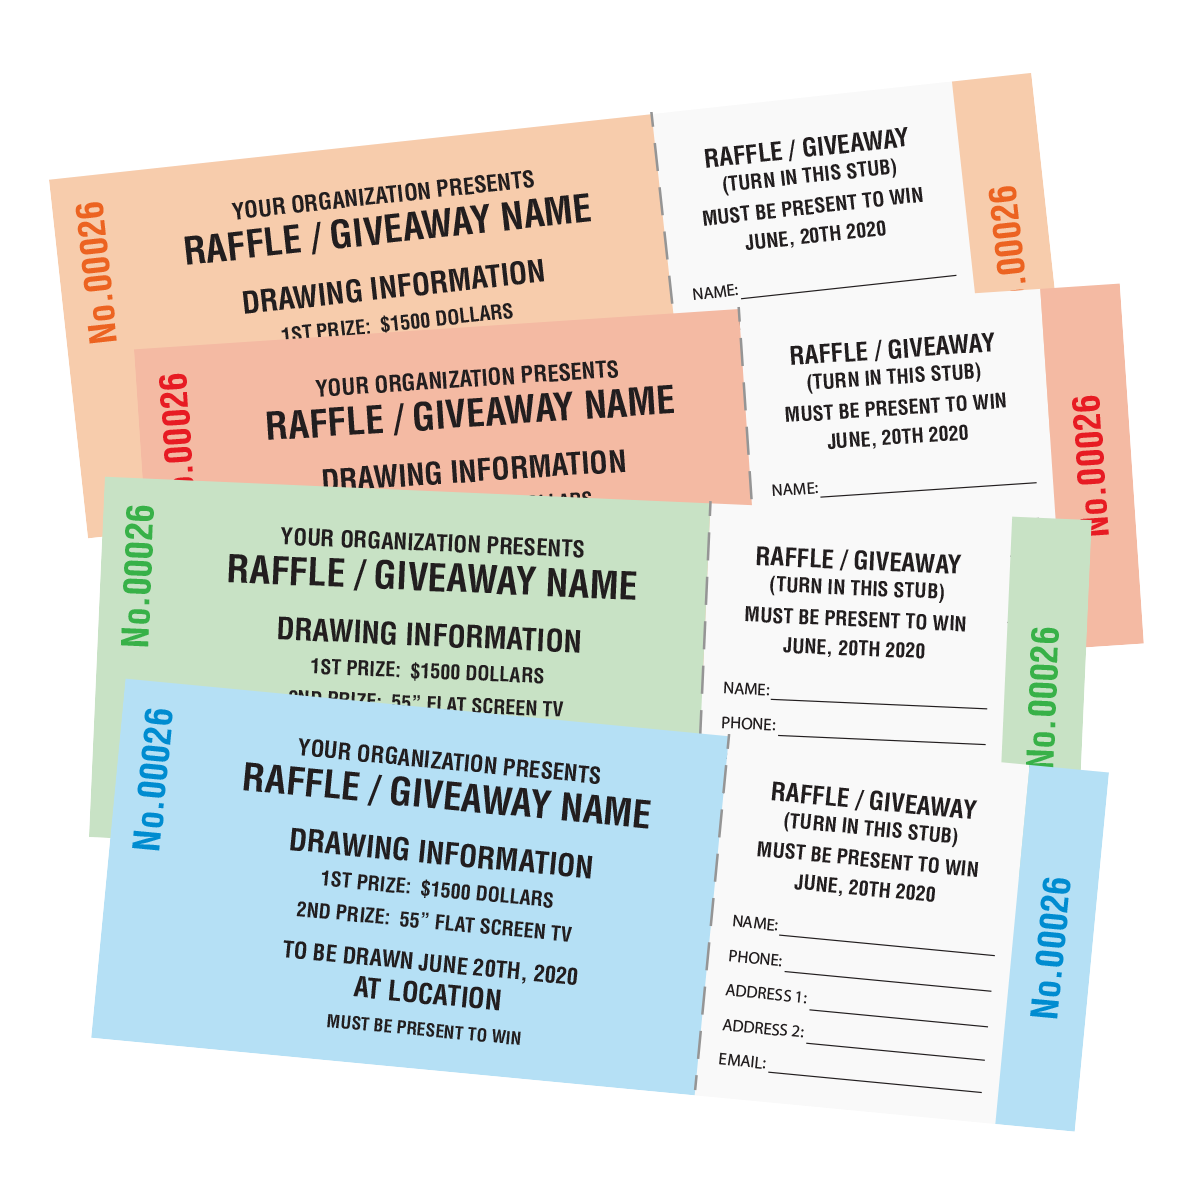 raffle ticket printing custom raffle tickets mines press picture of generic raffle tickets